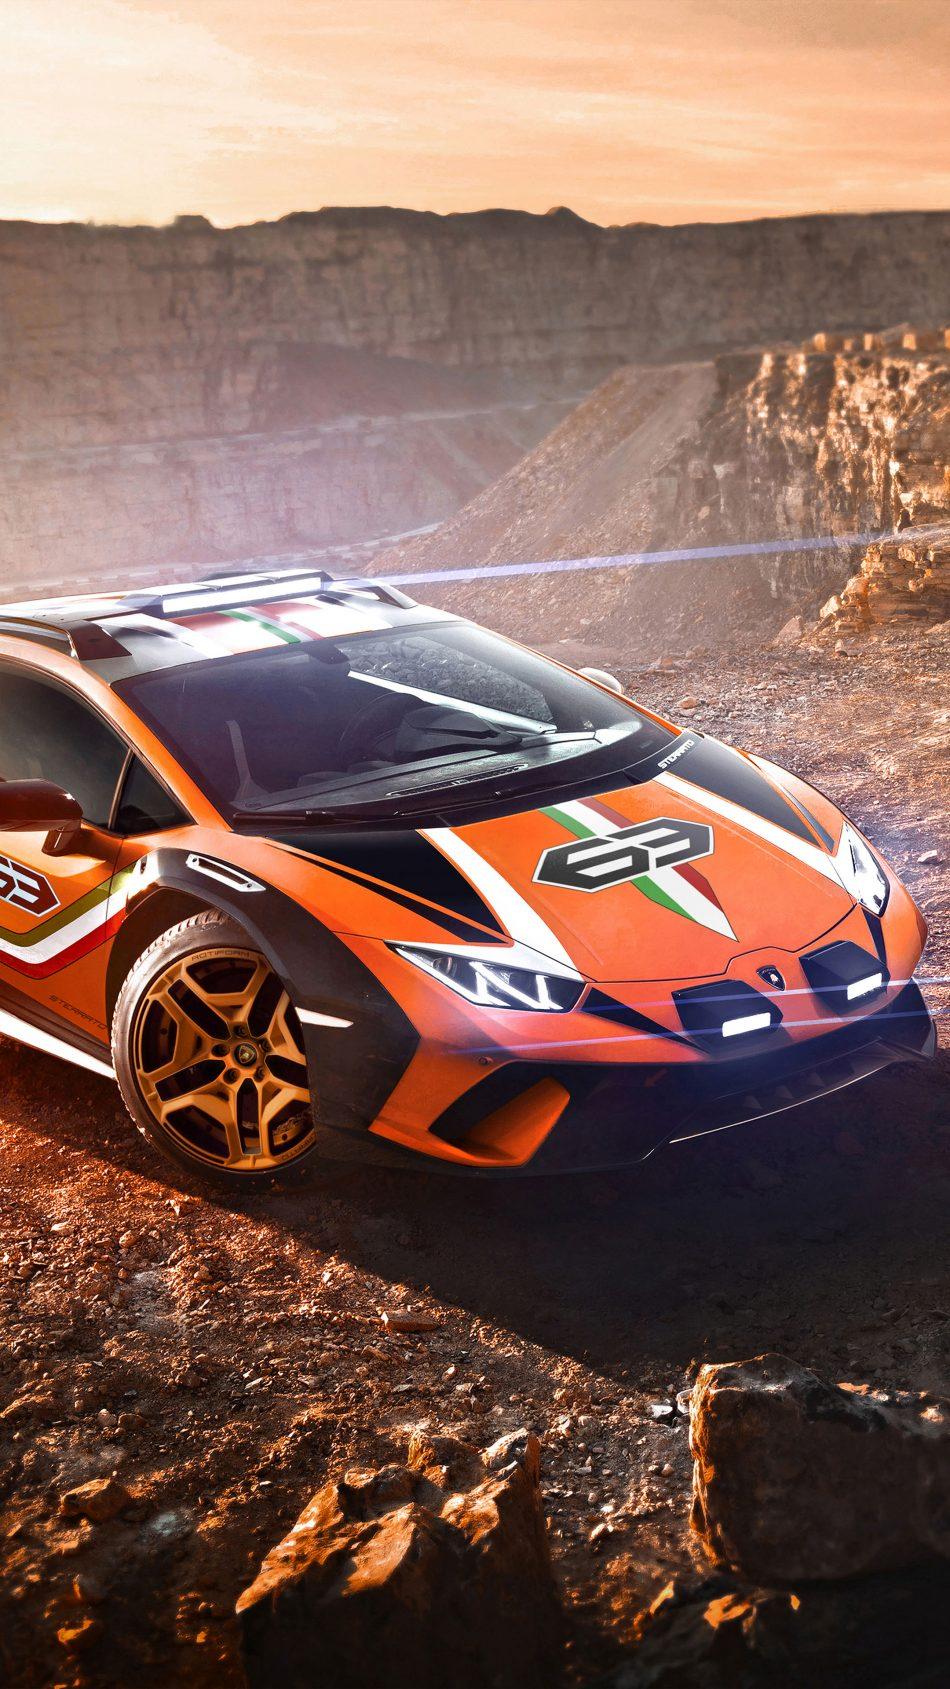 Lamborghini Huracan Sterrato Off Roading Supercar 4K Ultra HD Mobile Wallpaper